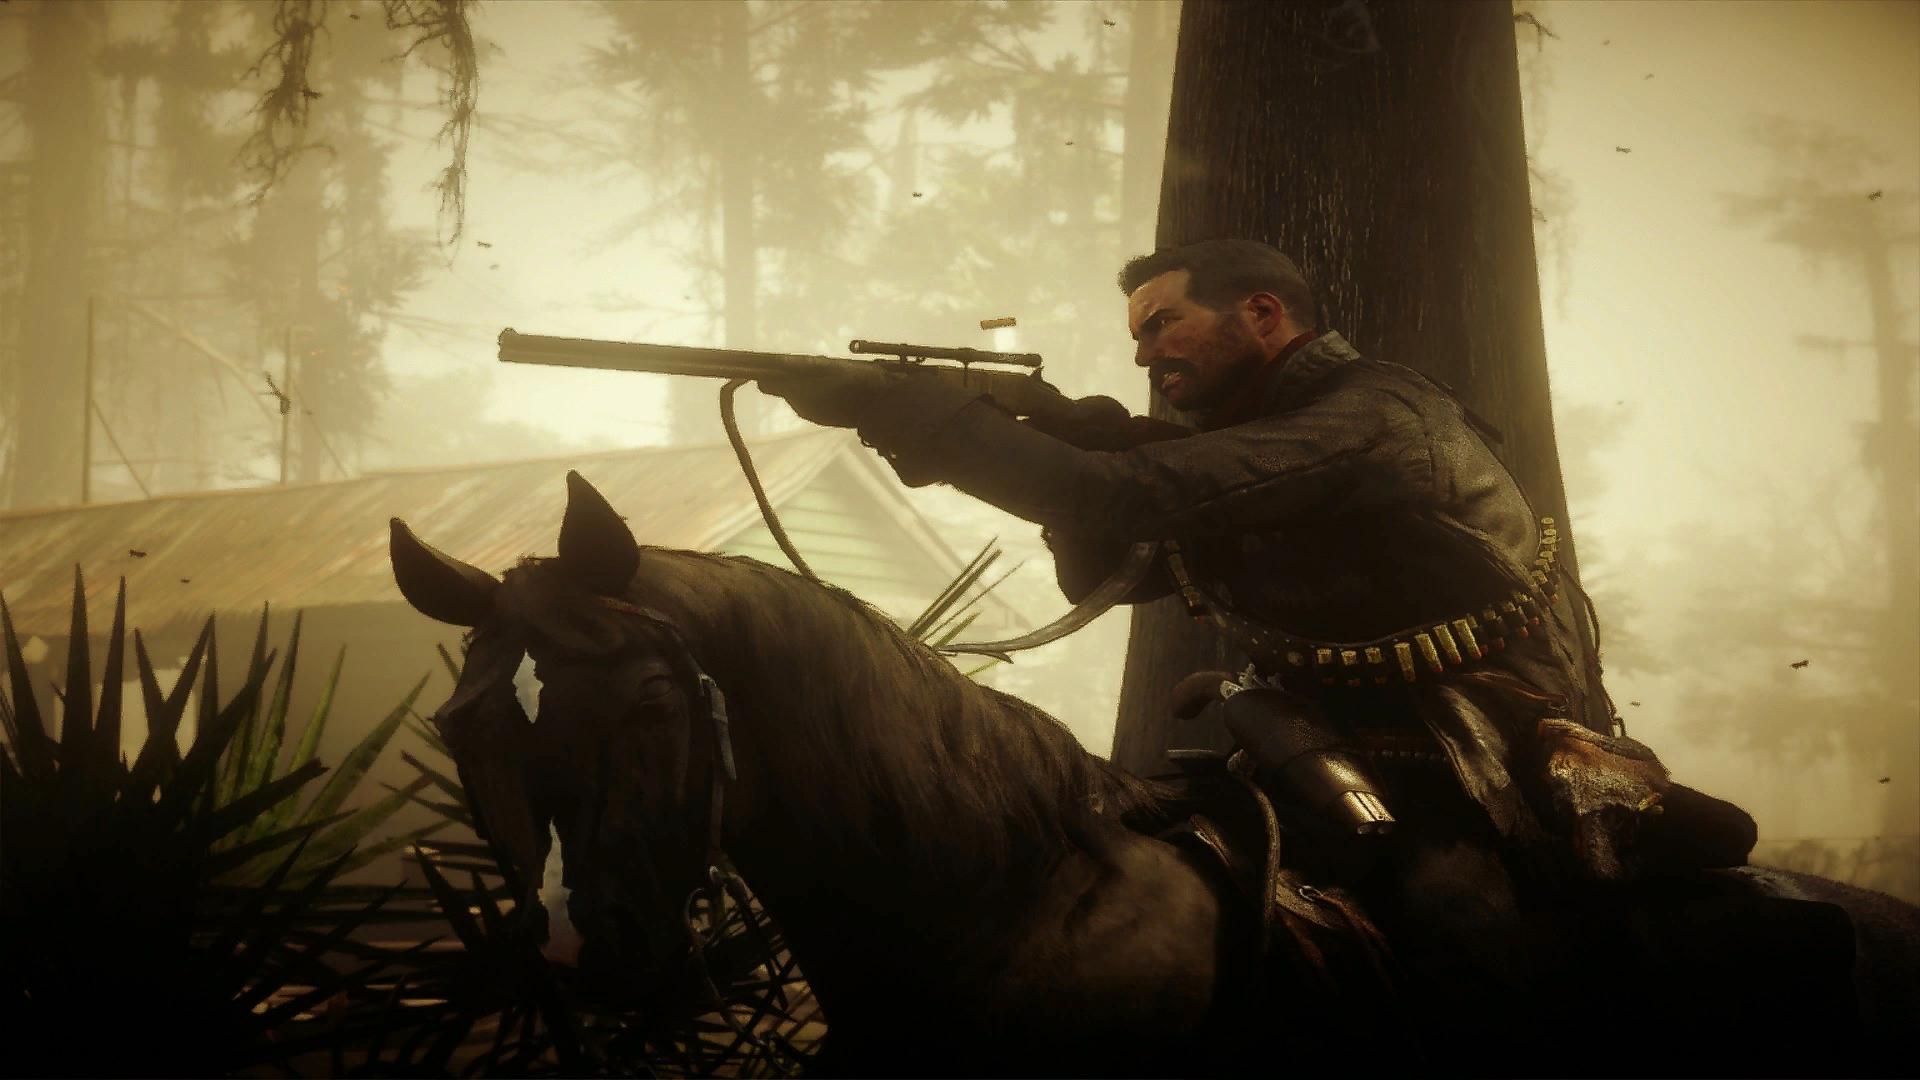 Red-Dead-Redemption-2-Screenshot-2020-06